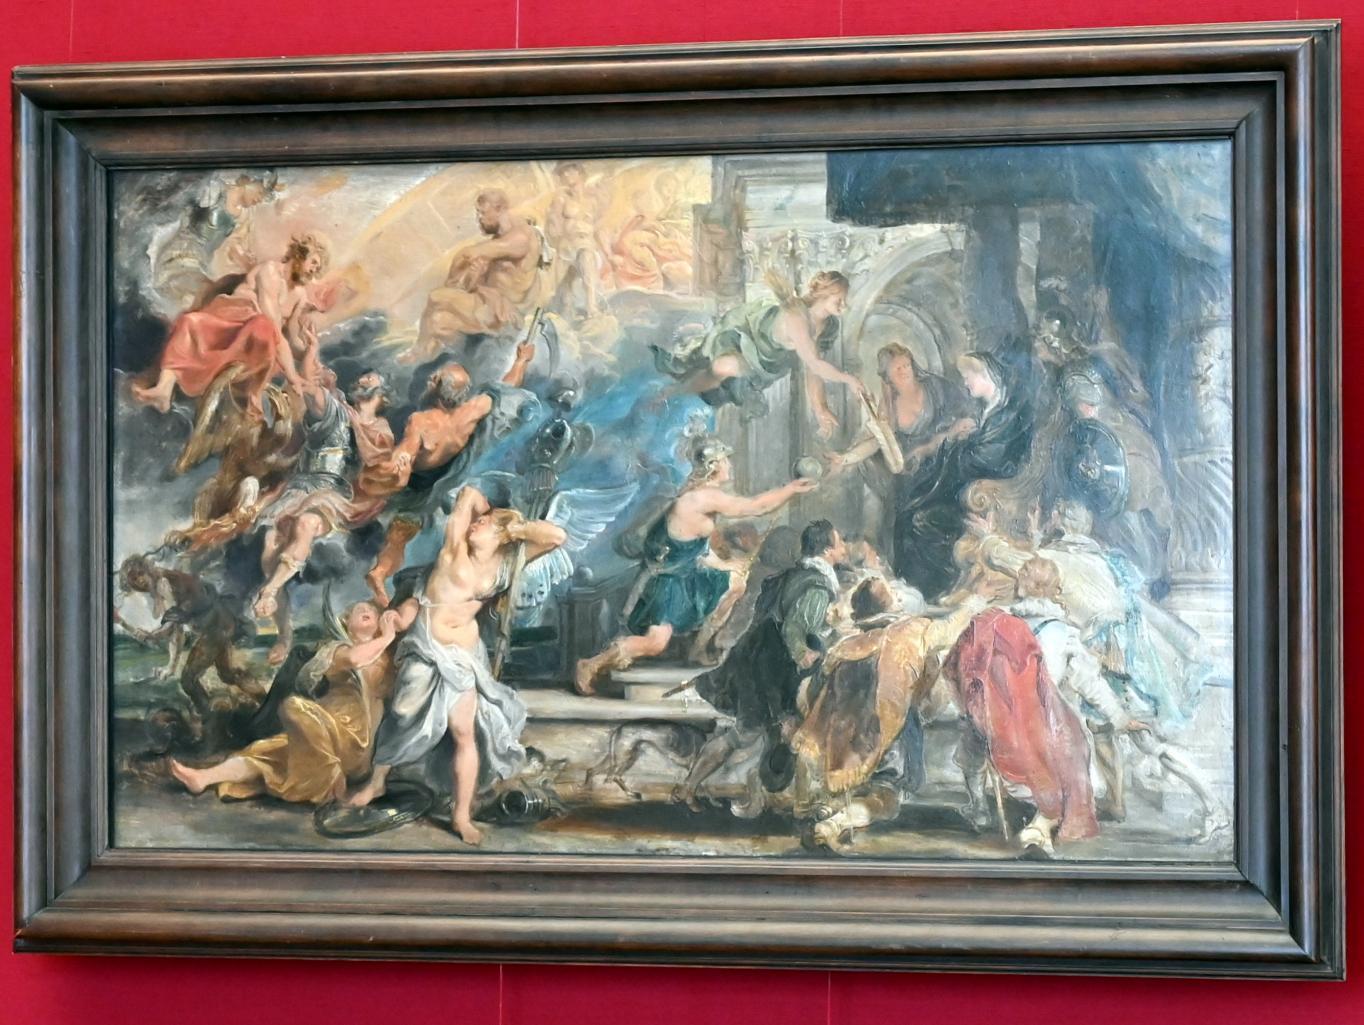 Peter Paul Rubens: Apotheose Heinrichs IV. und Proklamation der Regentschaft Maria de' Medicis (Skizze zum Medici-Zyklus), 1622